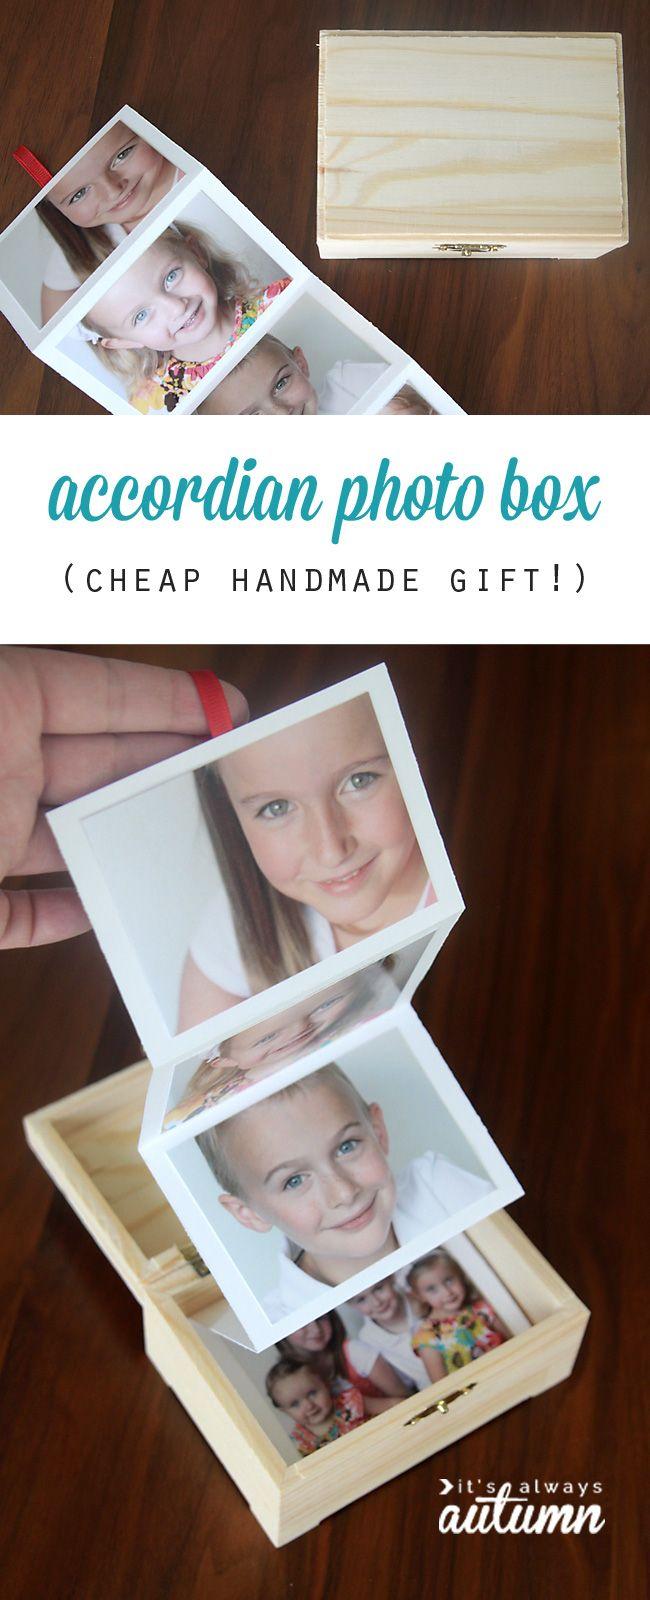 Easy cheap diy gift idea photo gift box christmas for Super cheap gift ideas